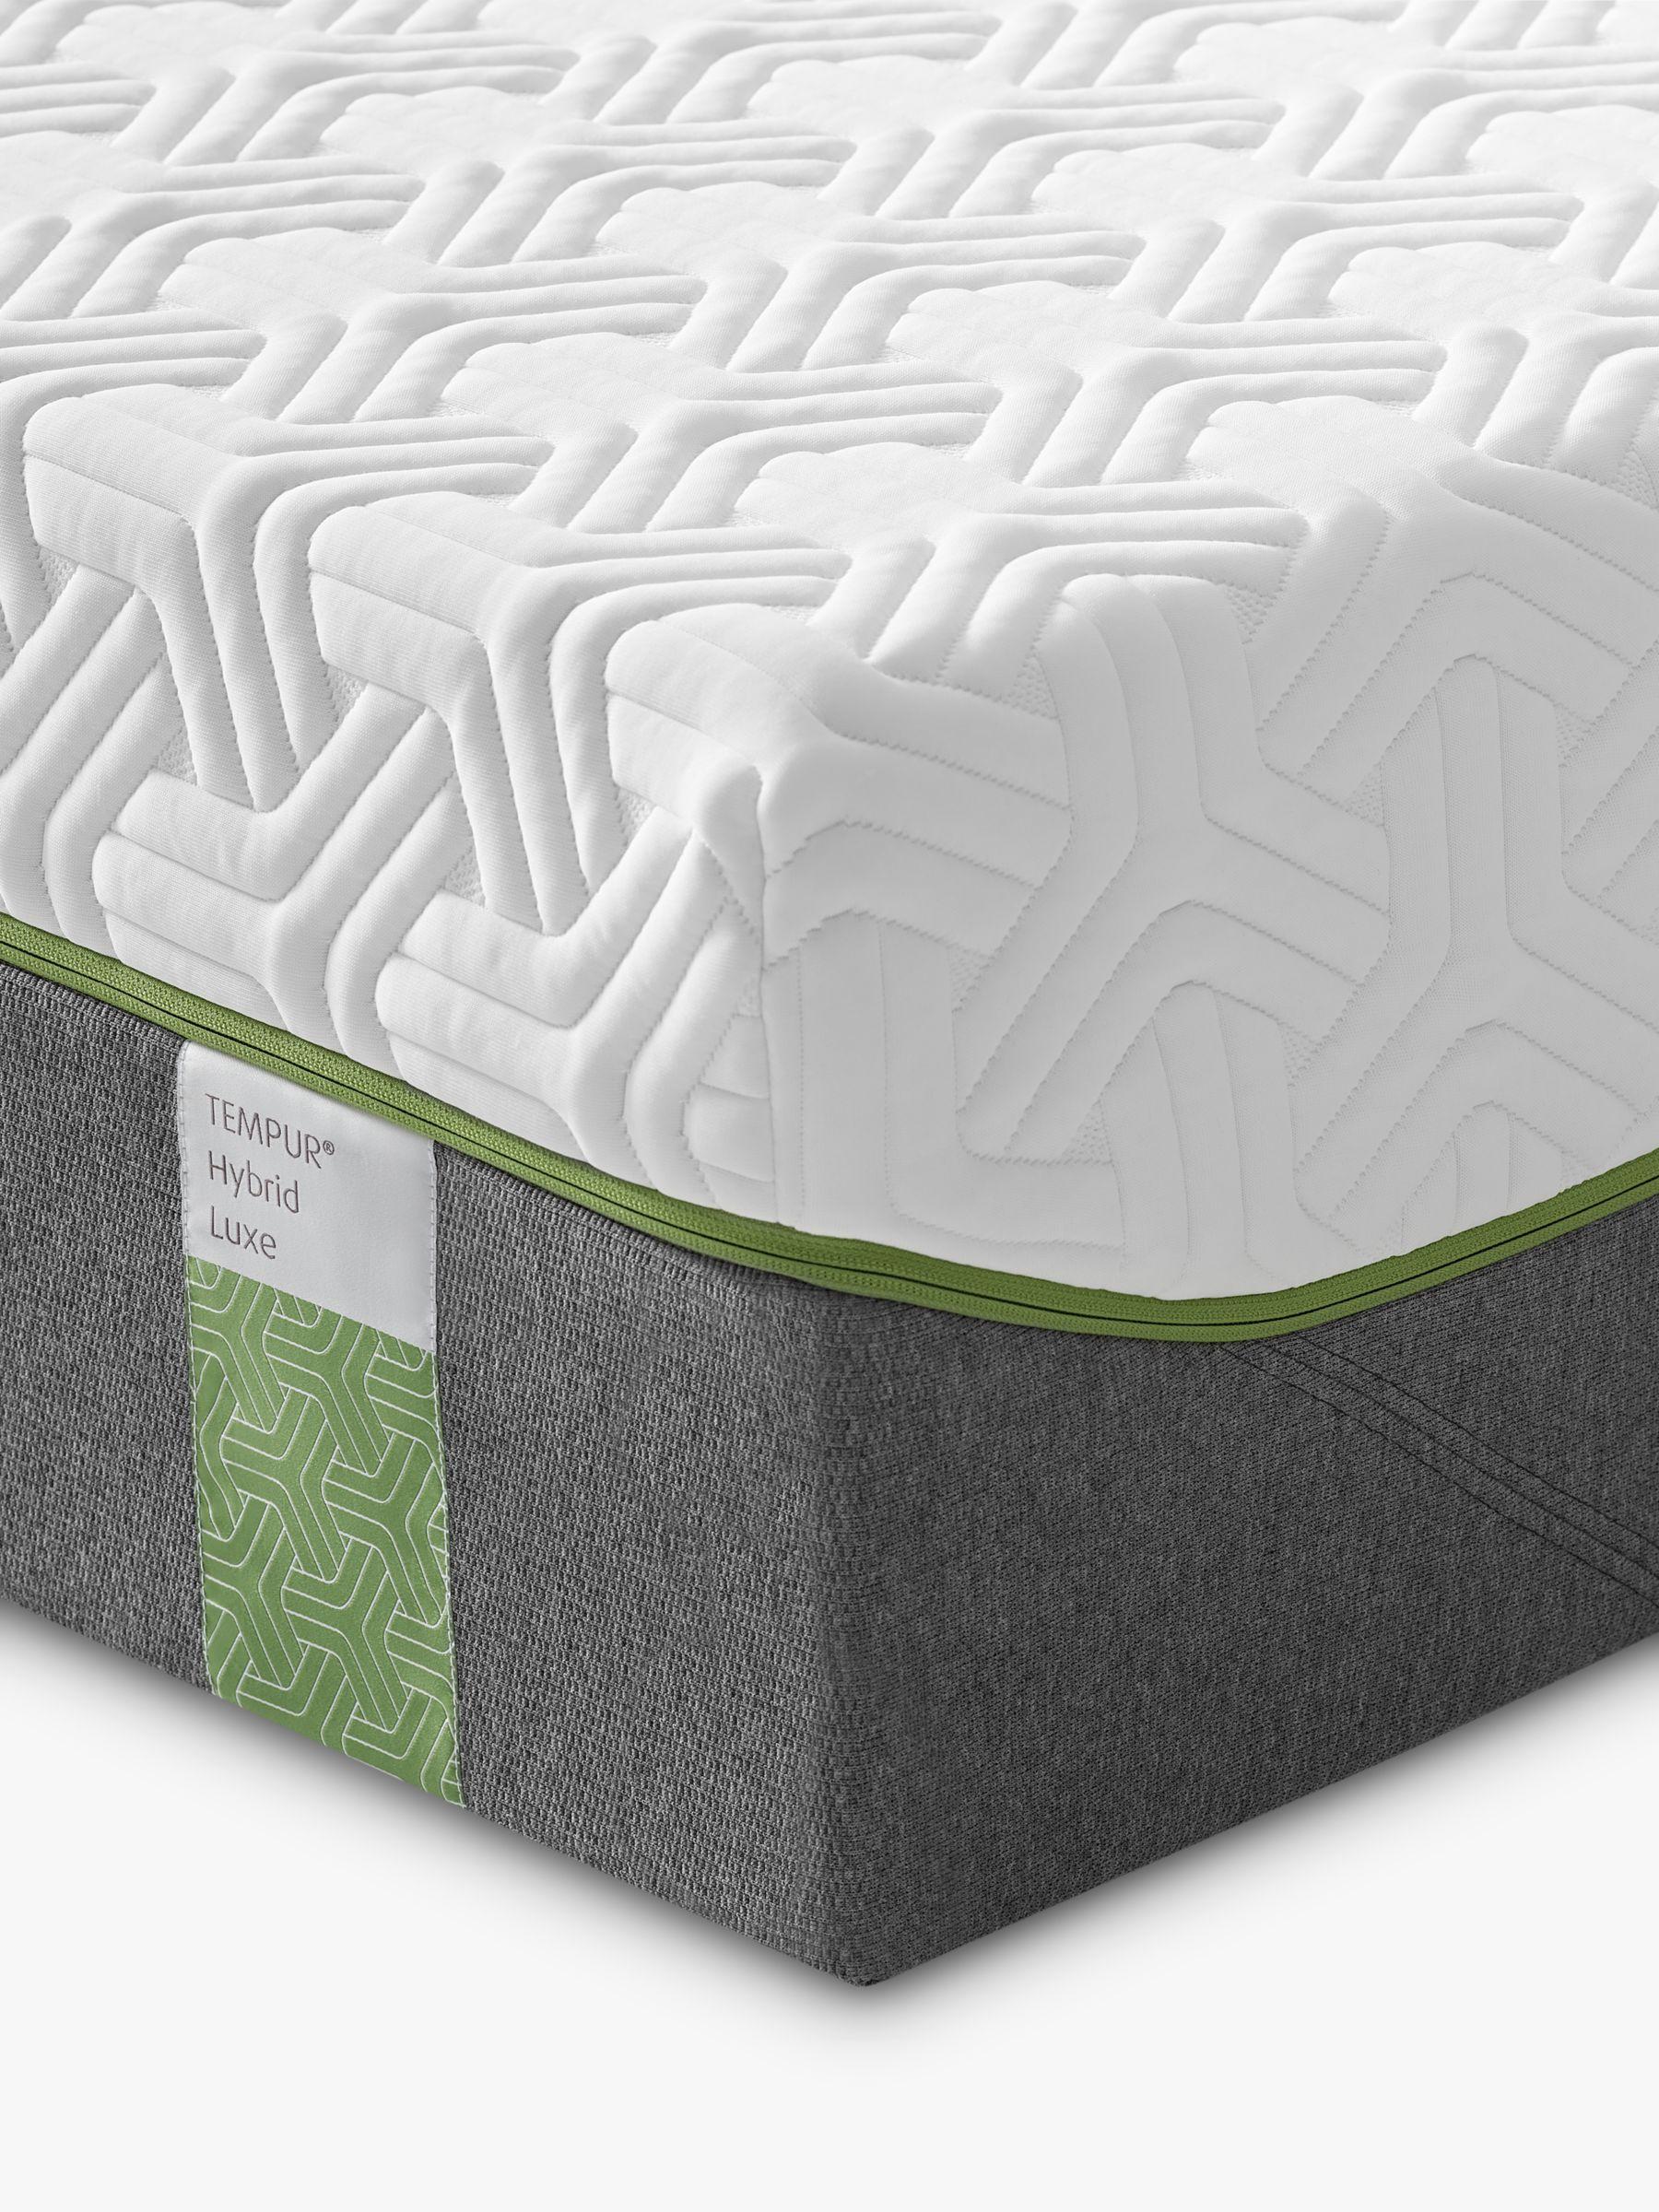 Tempur Tempur Hybrid Luxe Pocket Spring Memory Foam Mattress, King Size